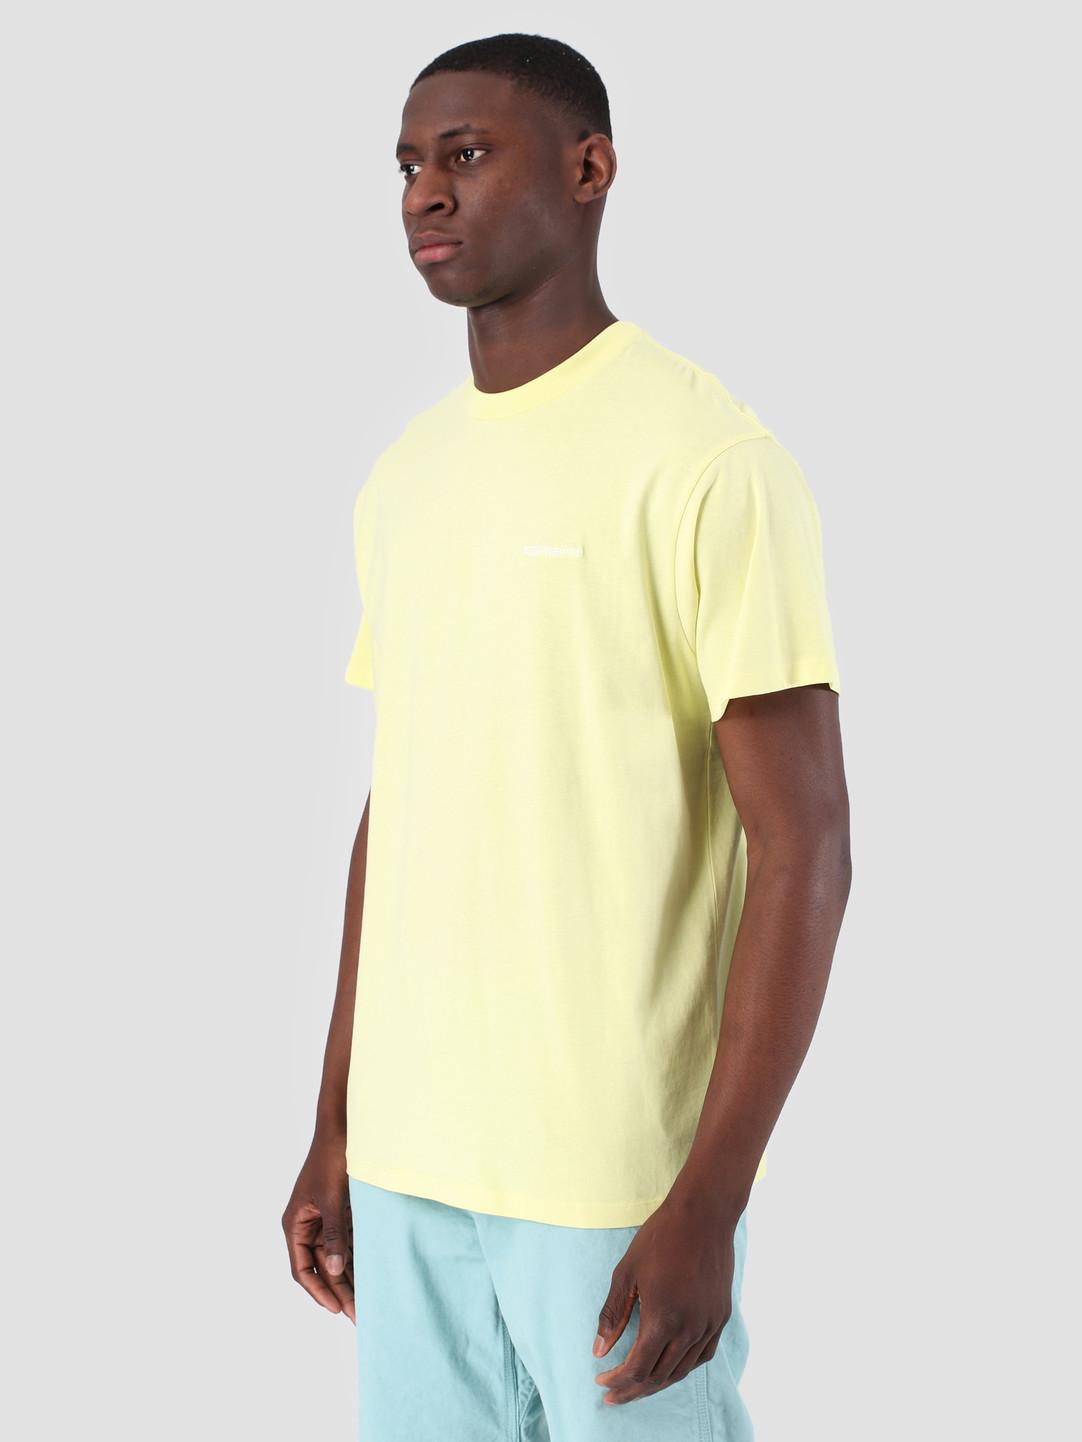 Carhartt WIP Carhartt WIP Short Sleeve Script Embroidery T-Shirt Honeydew White 61091000